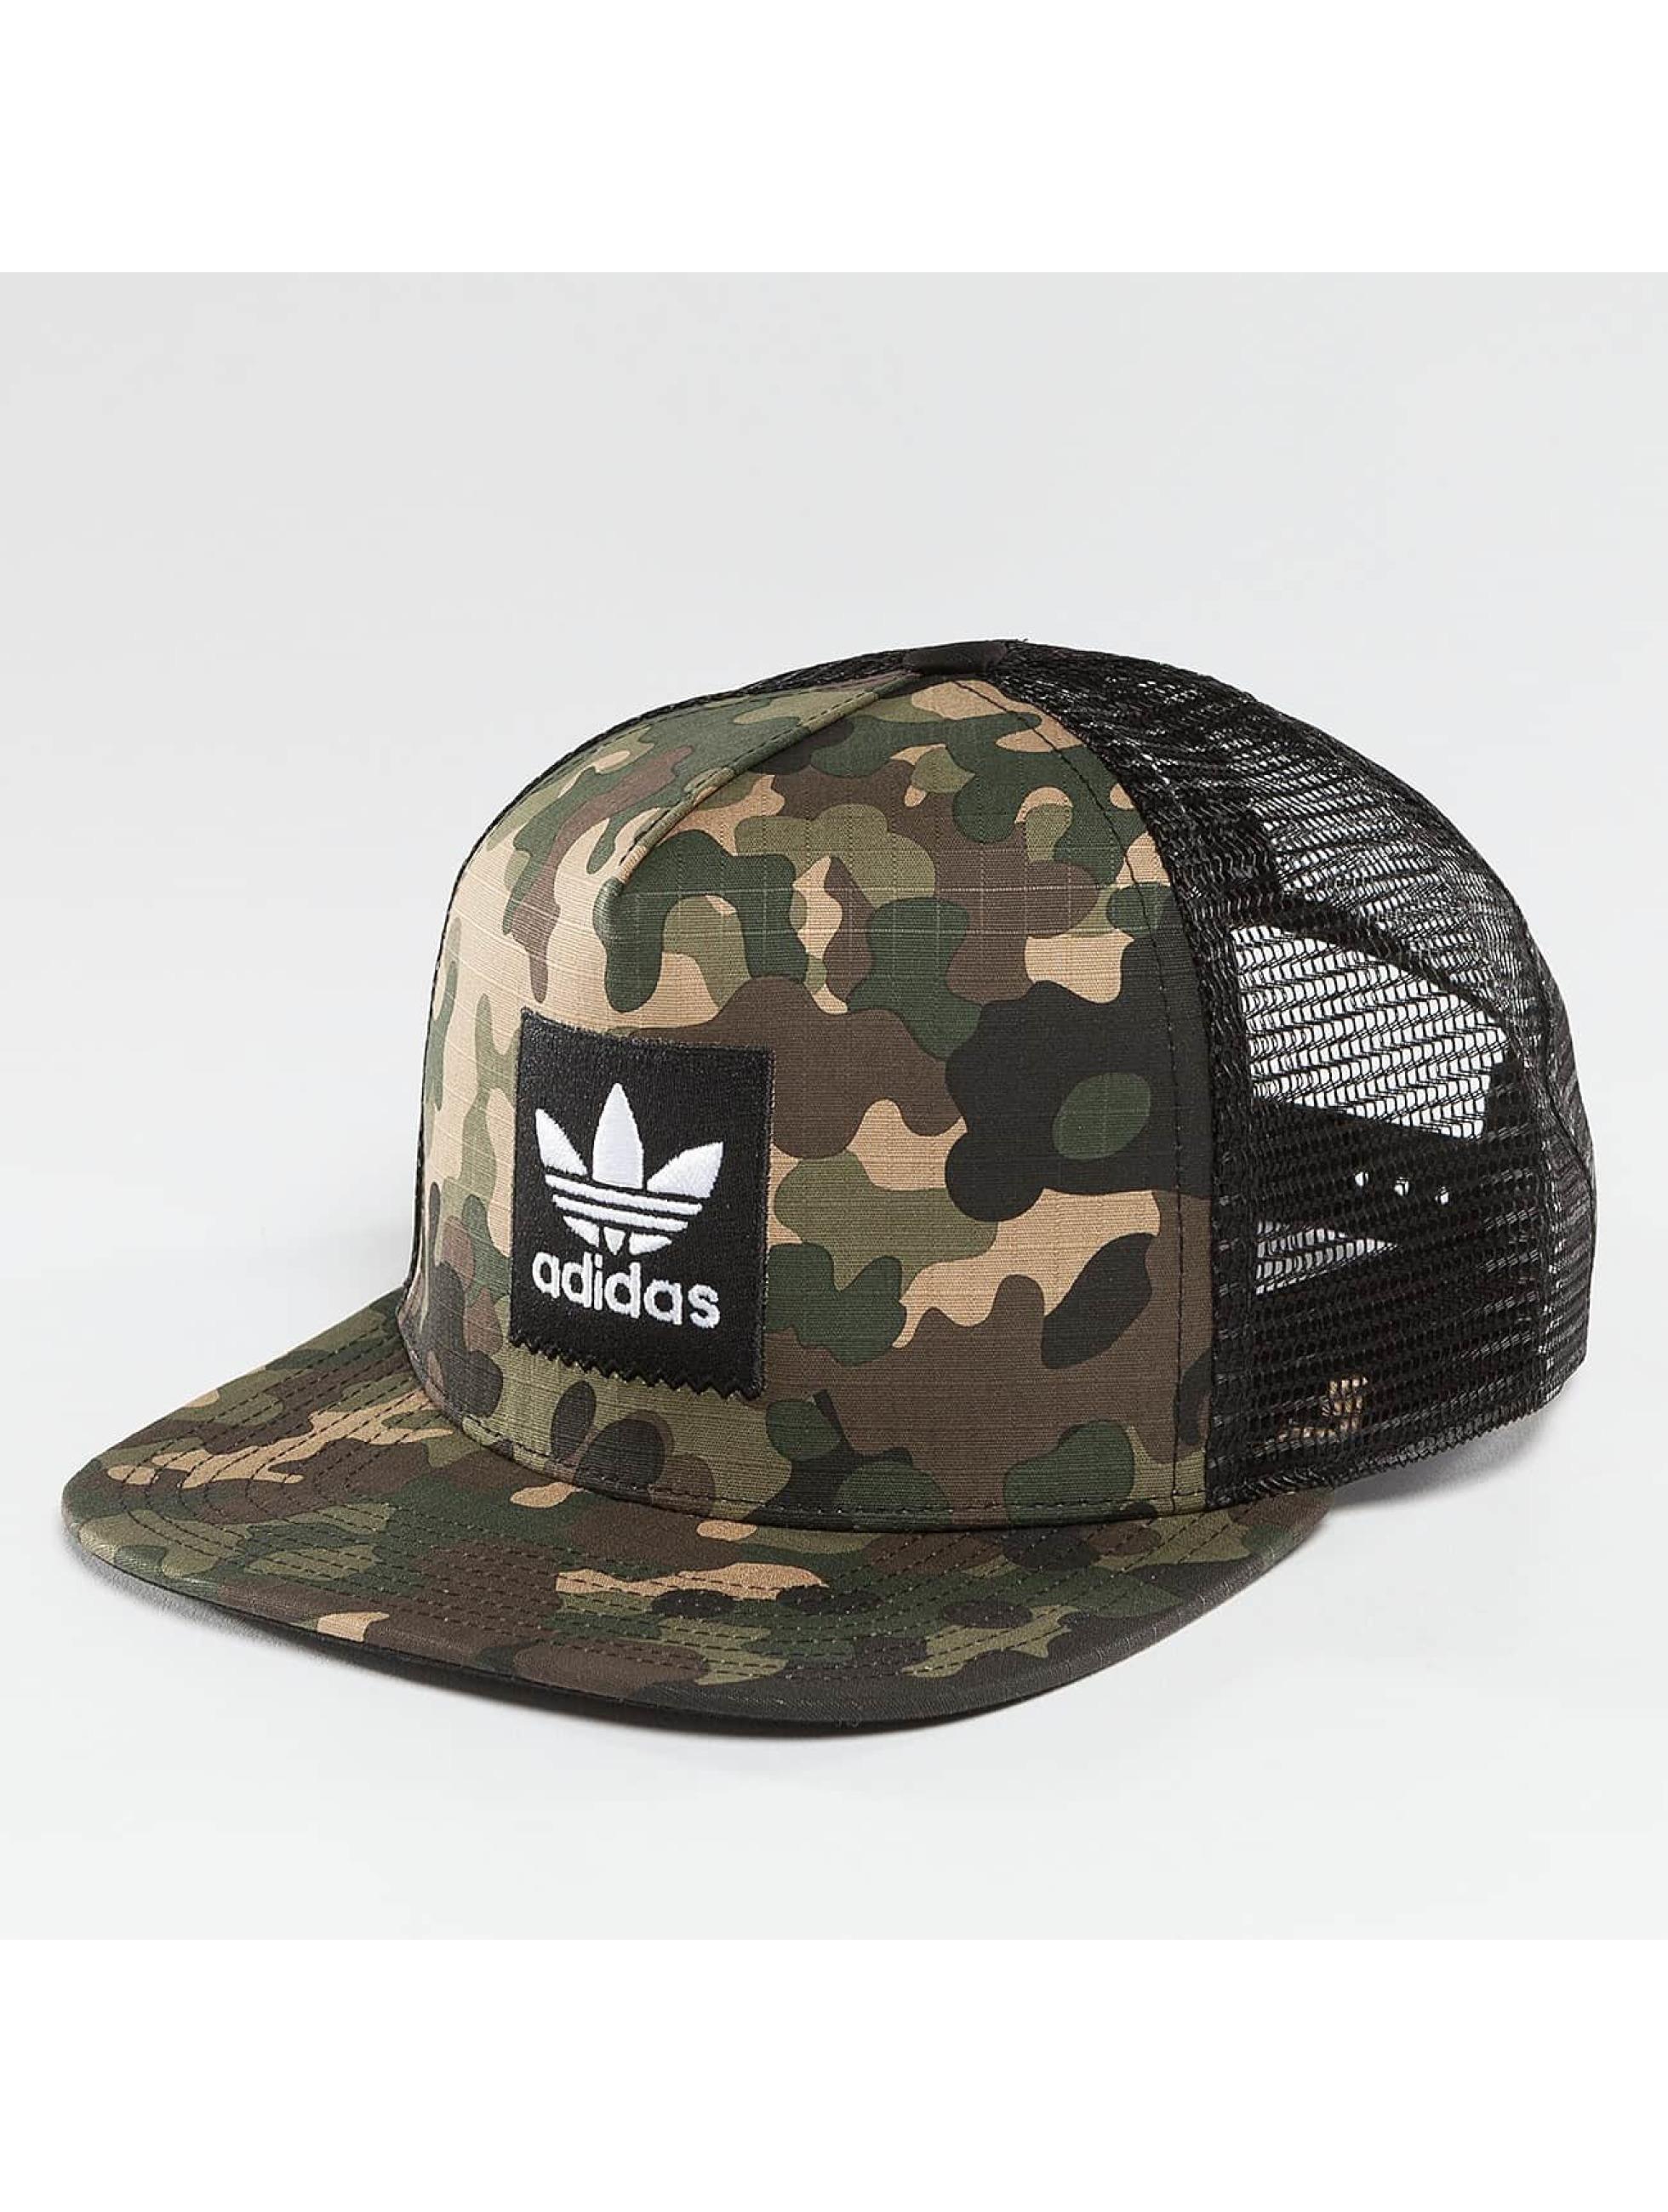 adidas / Trucker Cap Camo in camouflage